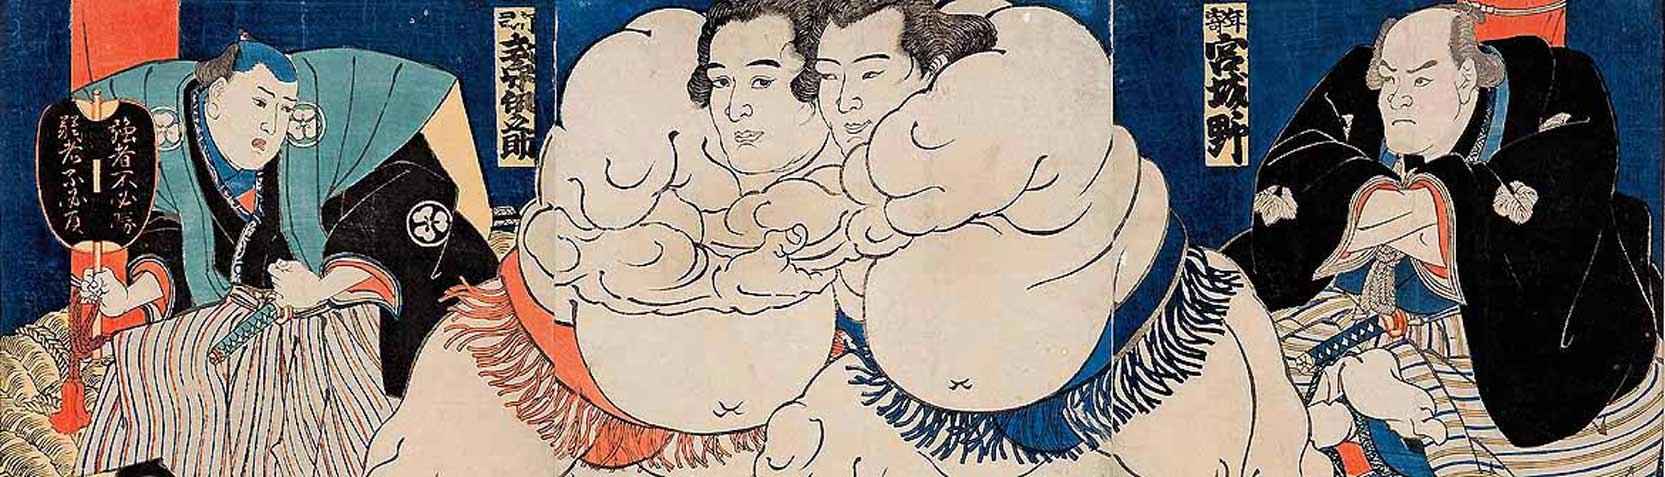 Artistes - Utagawa Kuniyoshi